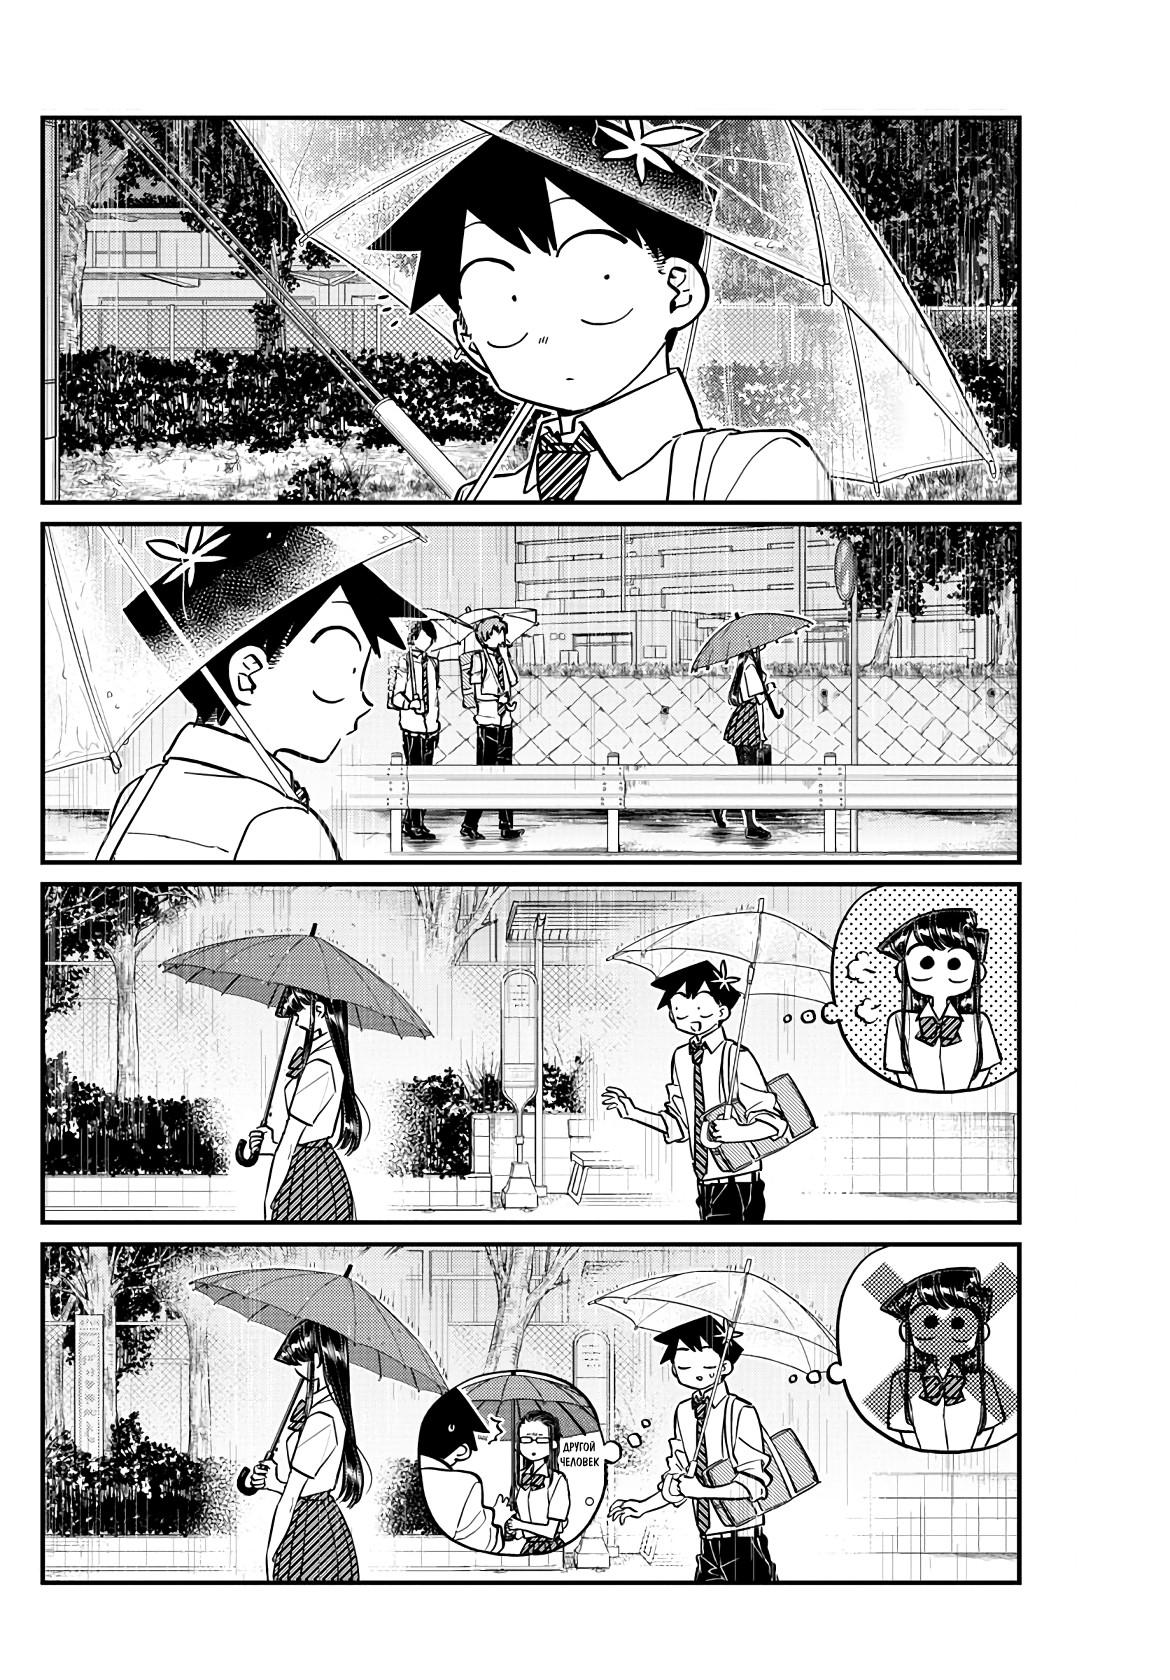 https://r2.ninemanga.com/comics/pic4/12/27788/1350395/1559237536110.jpg Page 4